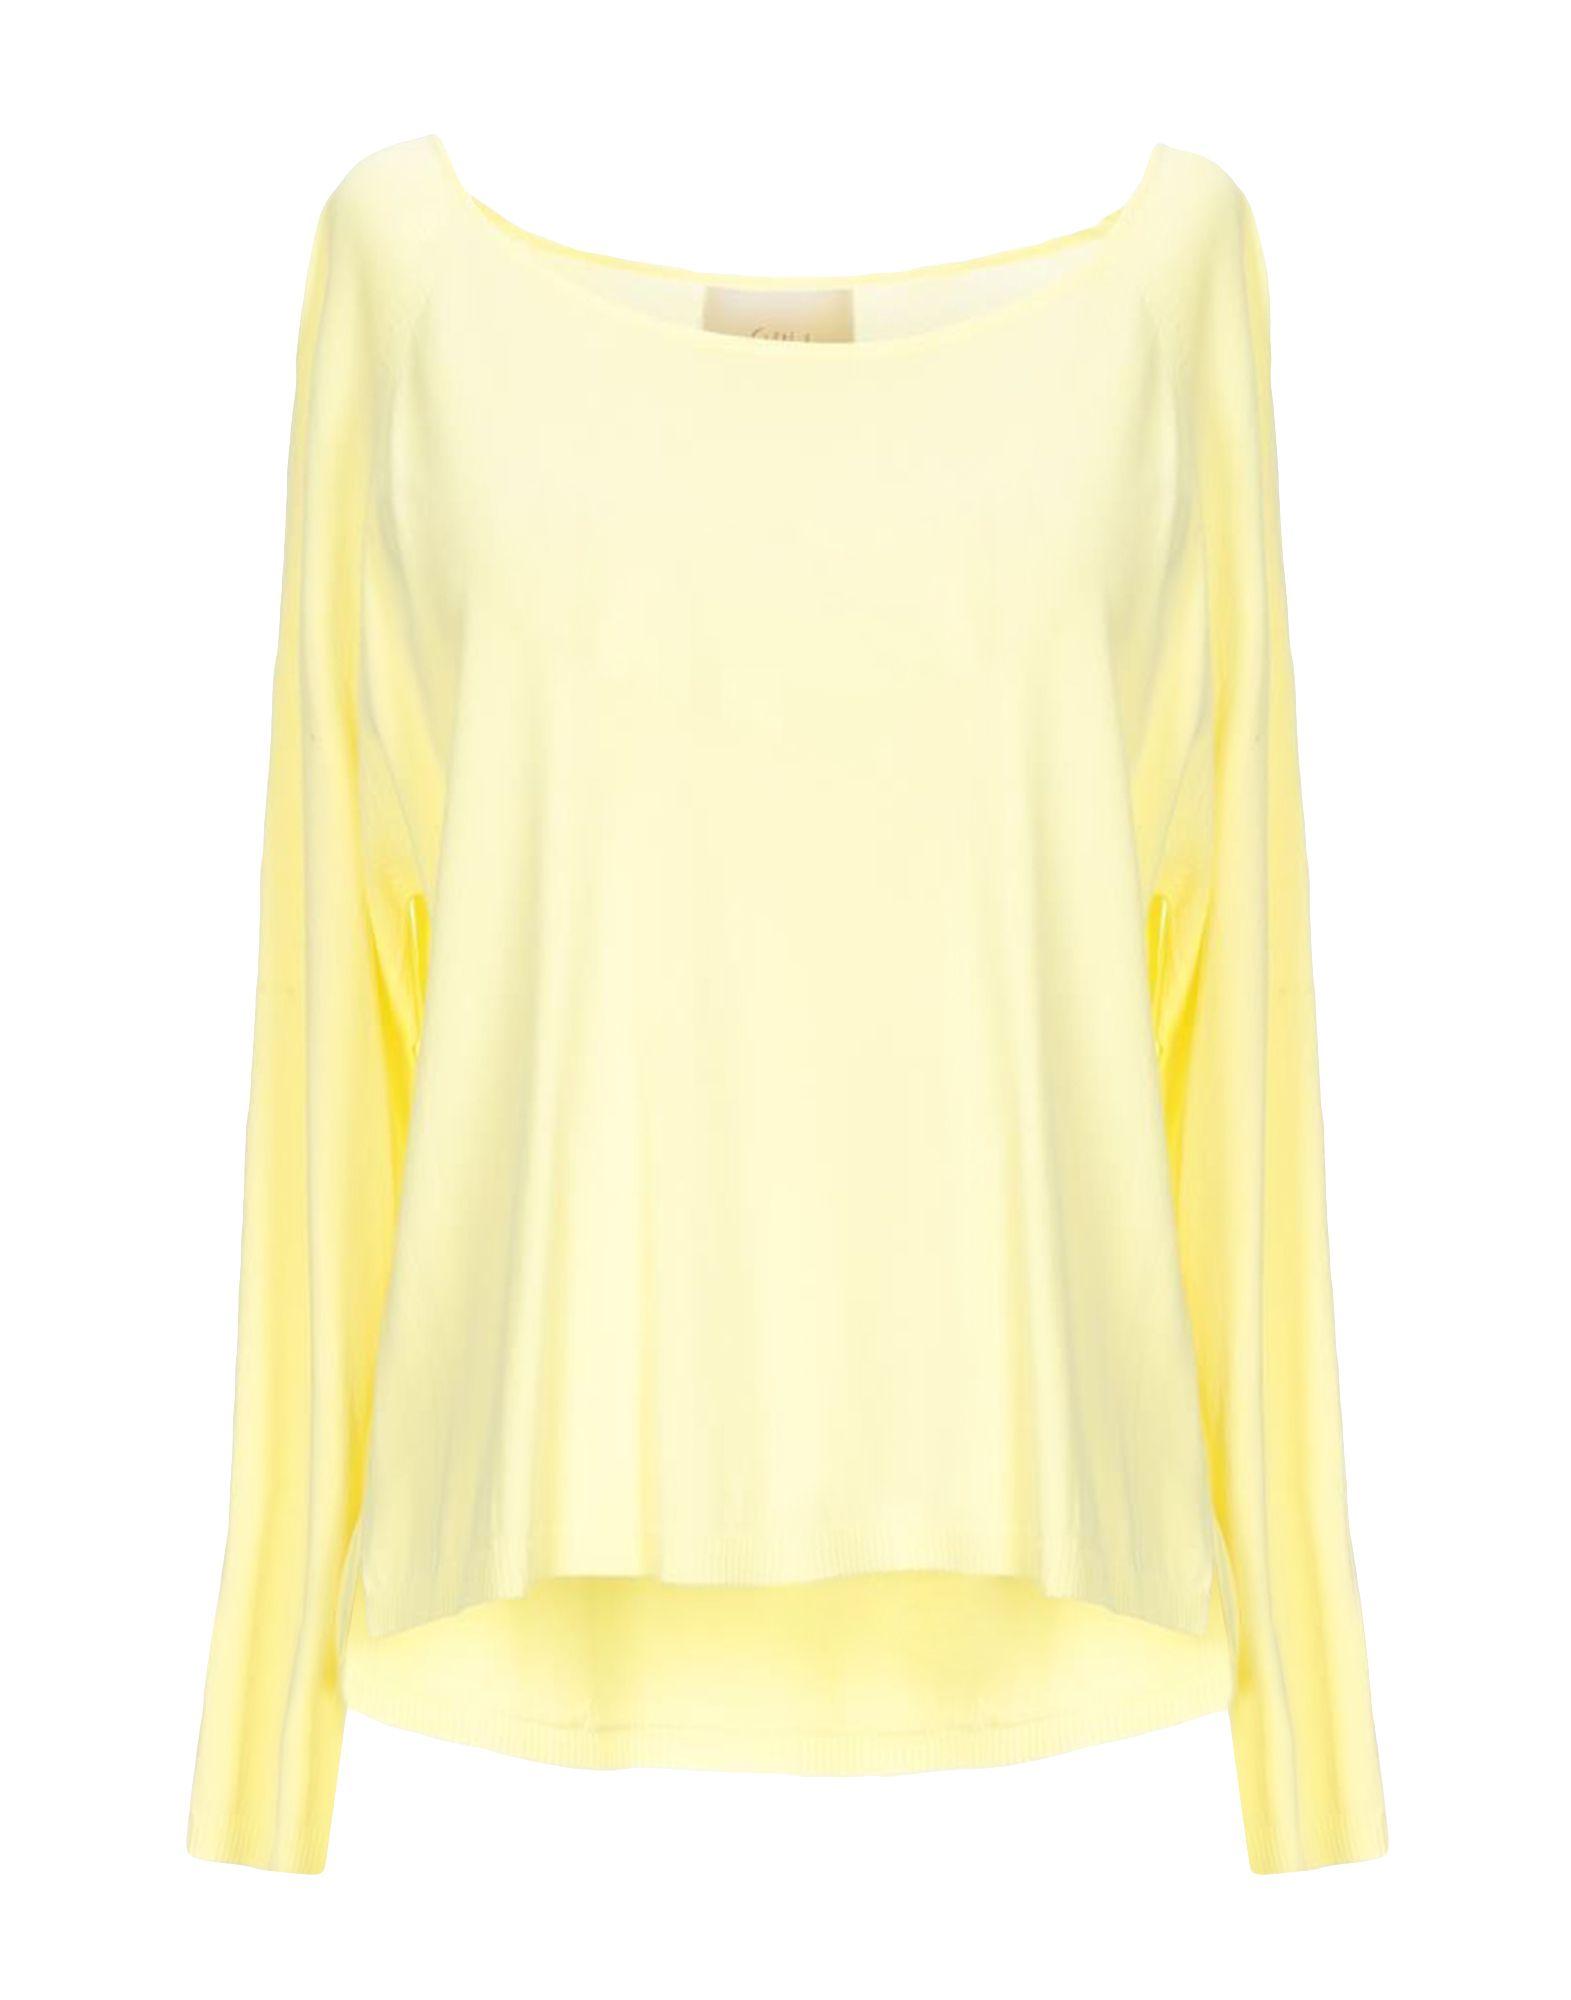 CHILI Sweaters - Item 14008395